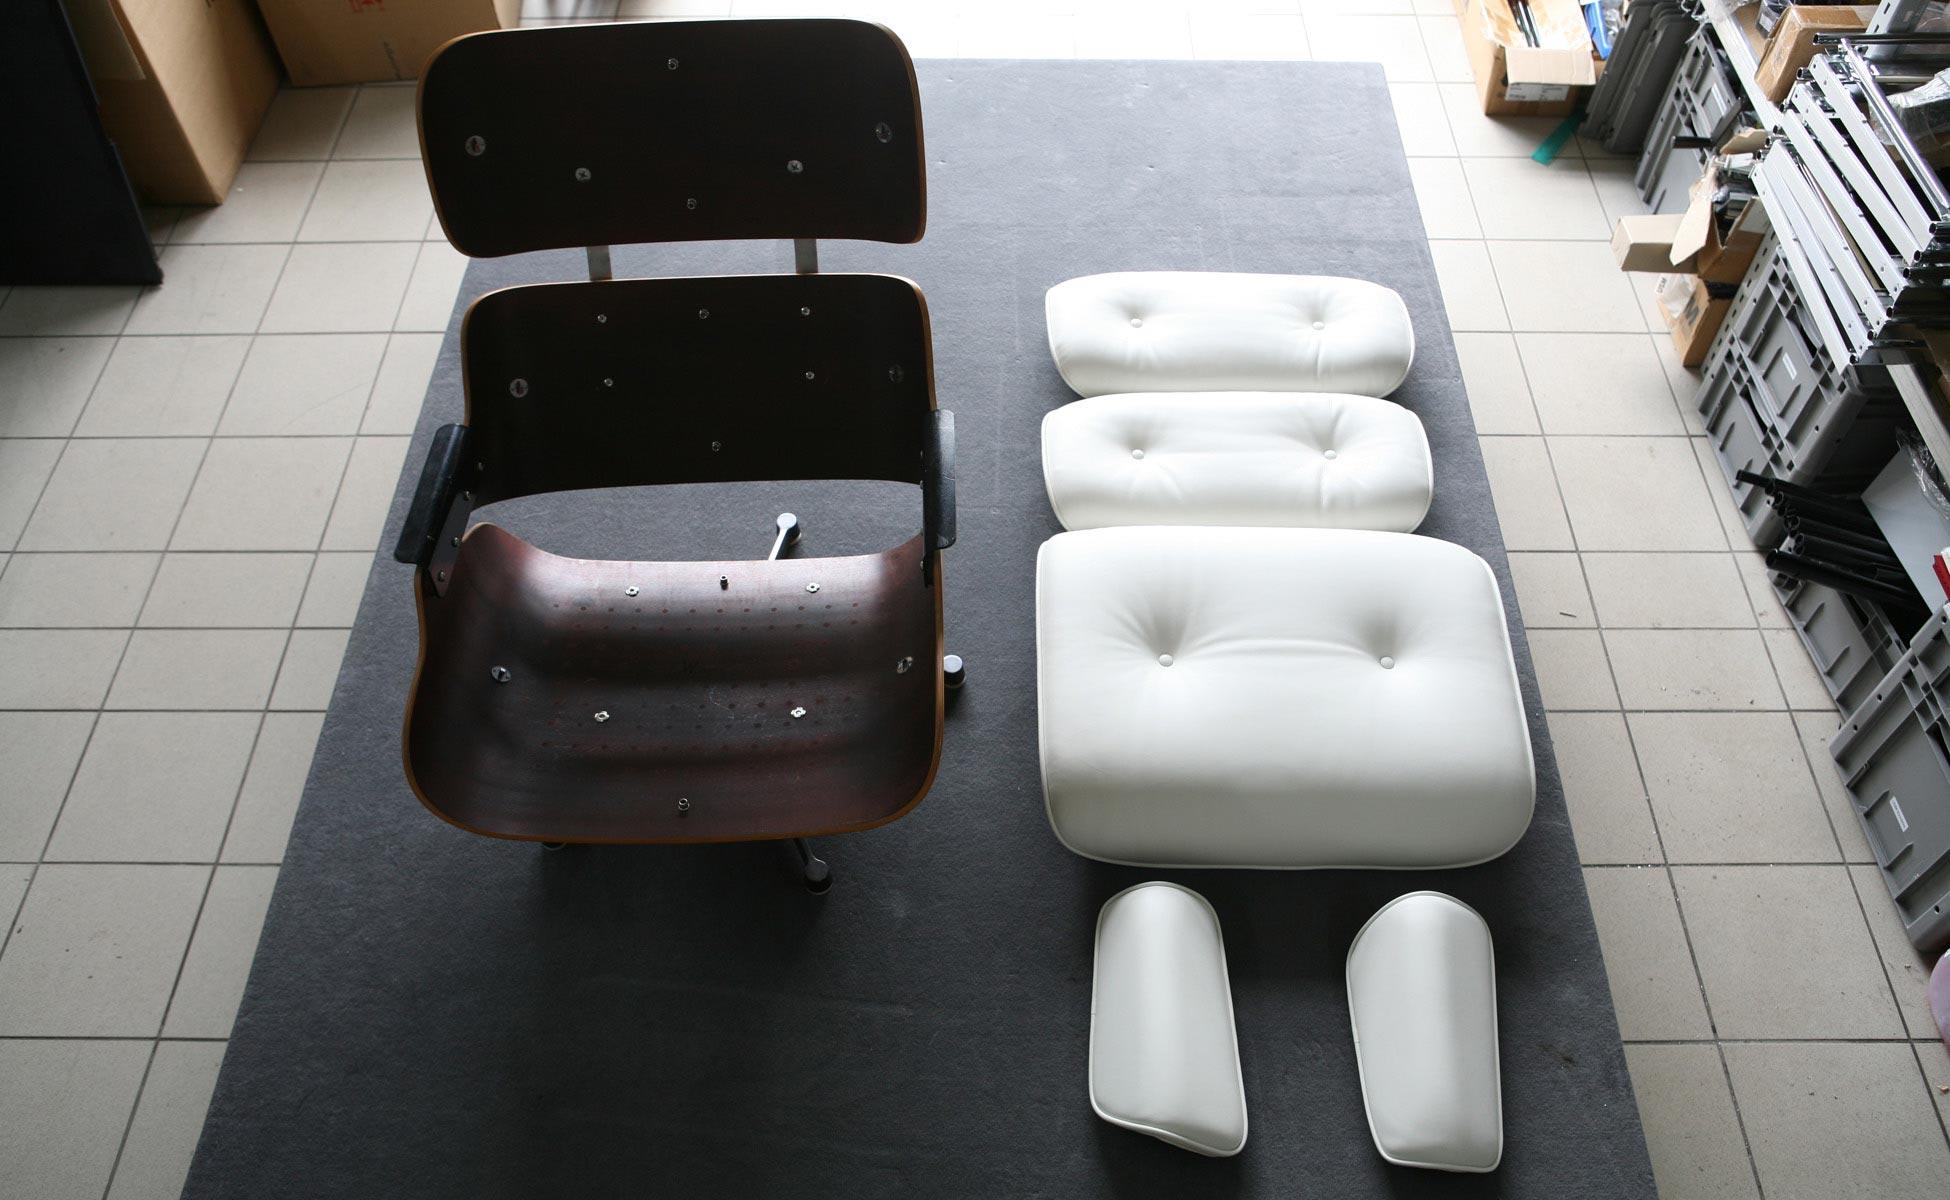 01 reparatur vitra eames lounge chair ersatzteile in berlin